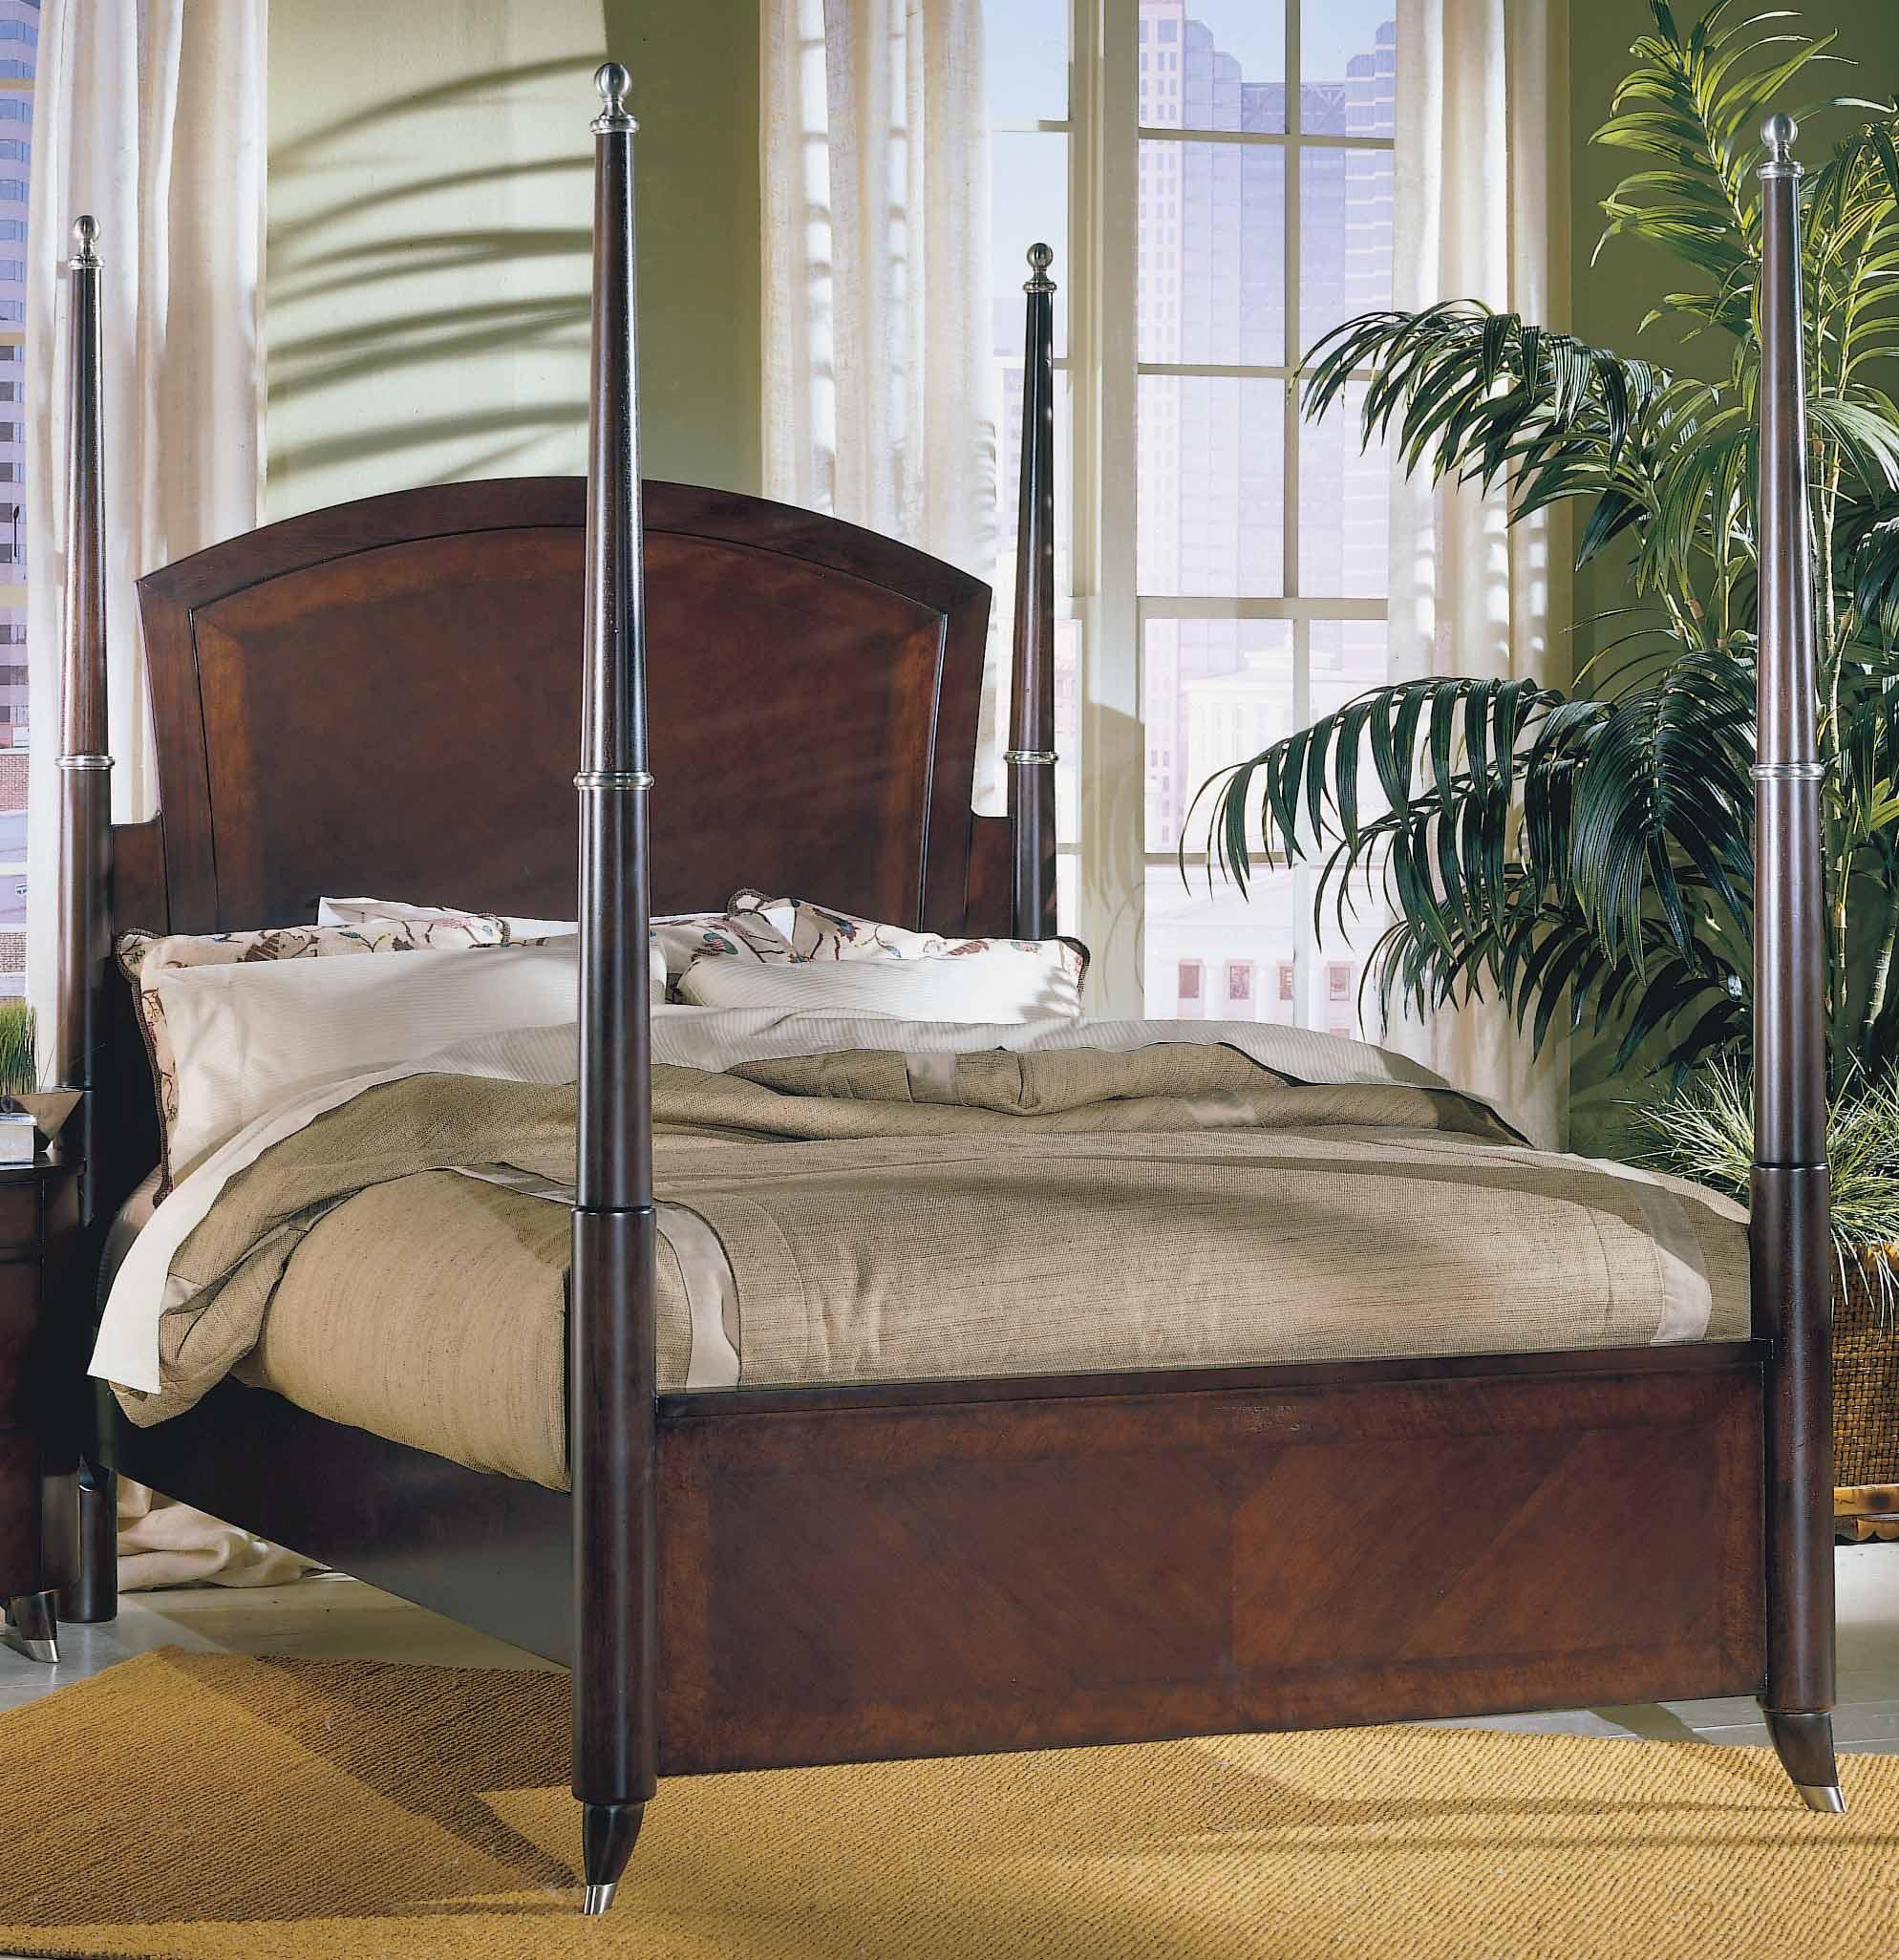 Homelegance Levato Poster Bed